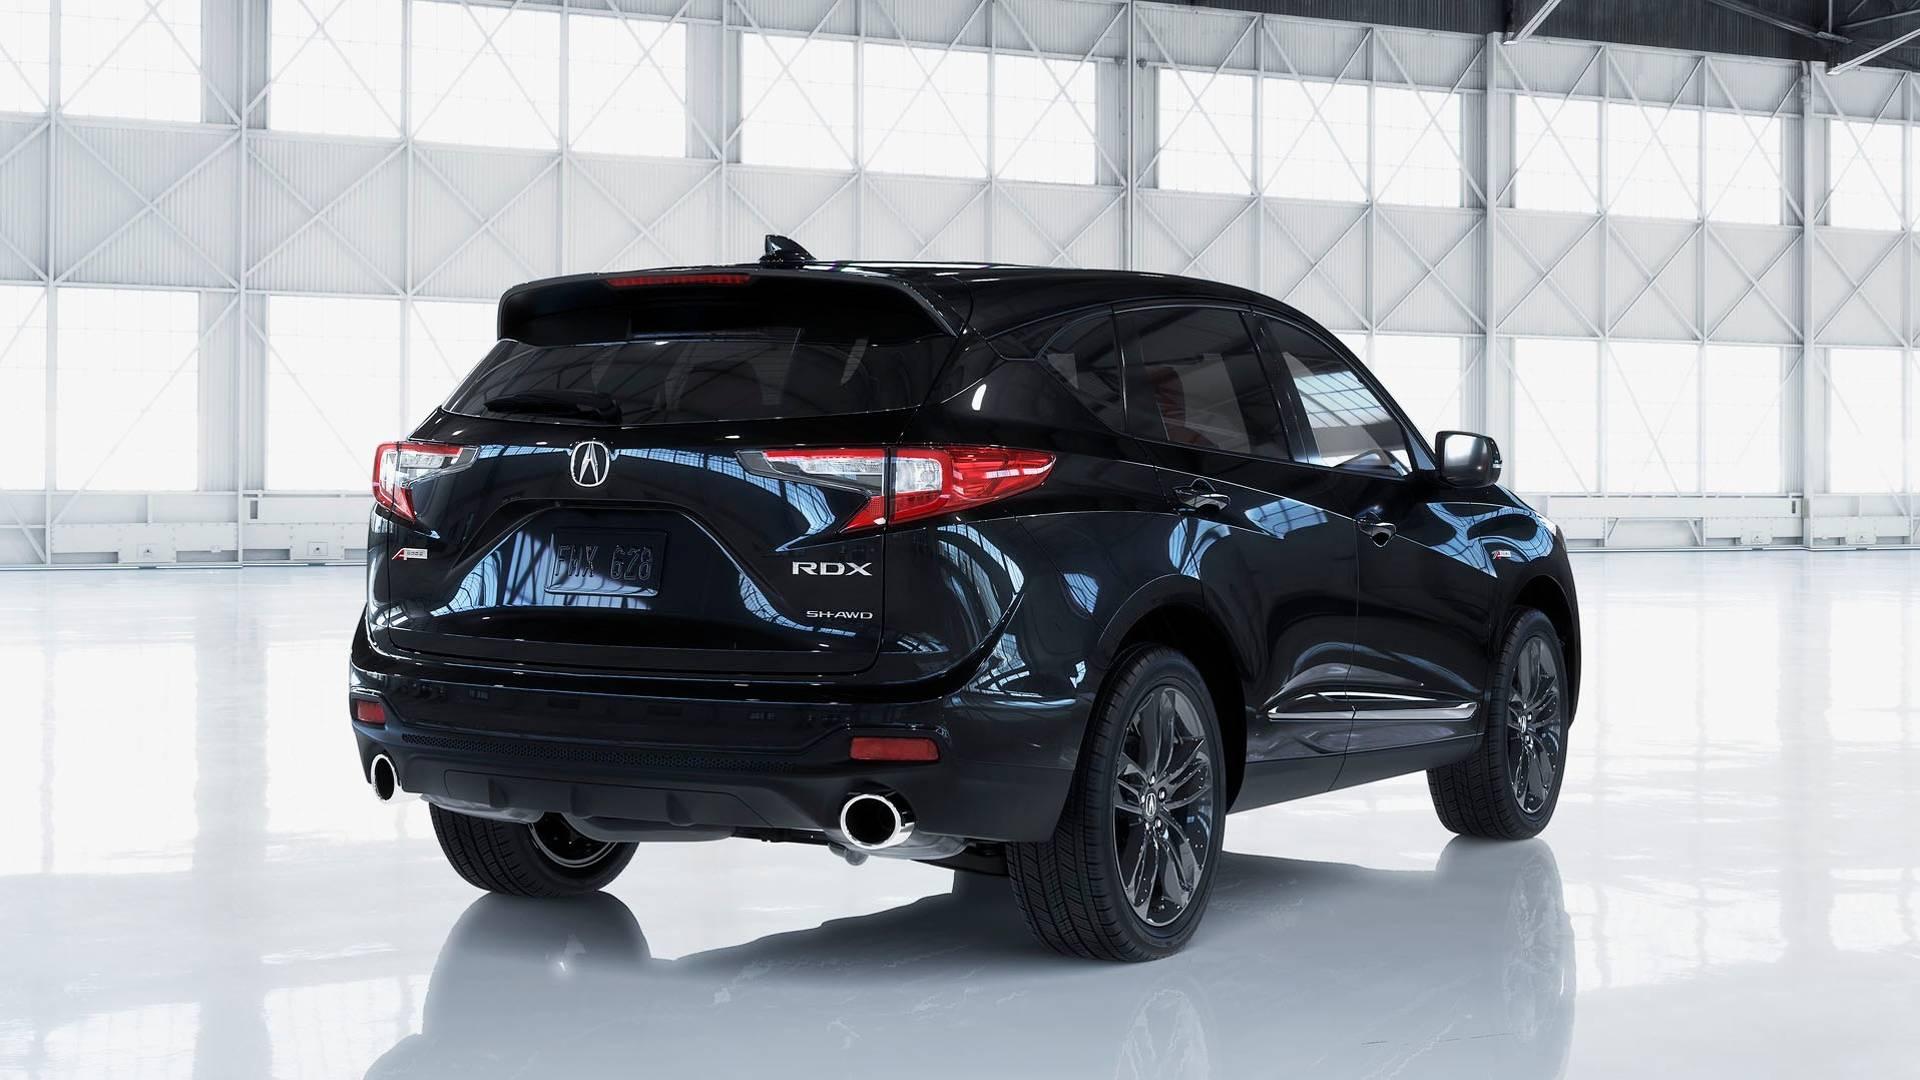 2019 Acura RDX Makes World Debut In NY, Boasts 2.0-liter ...